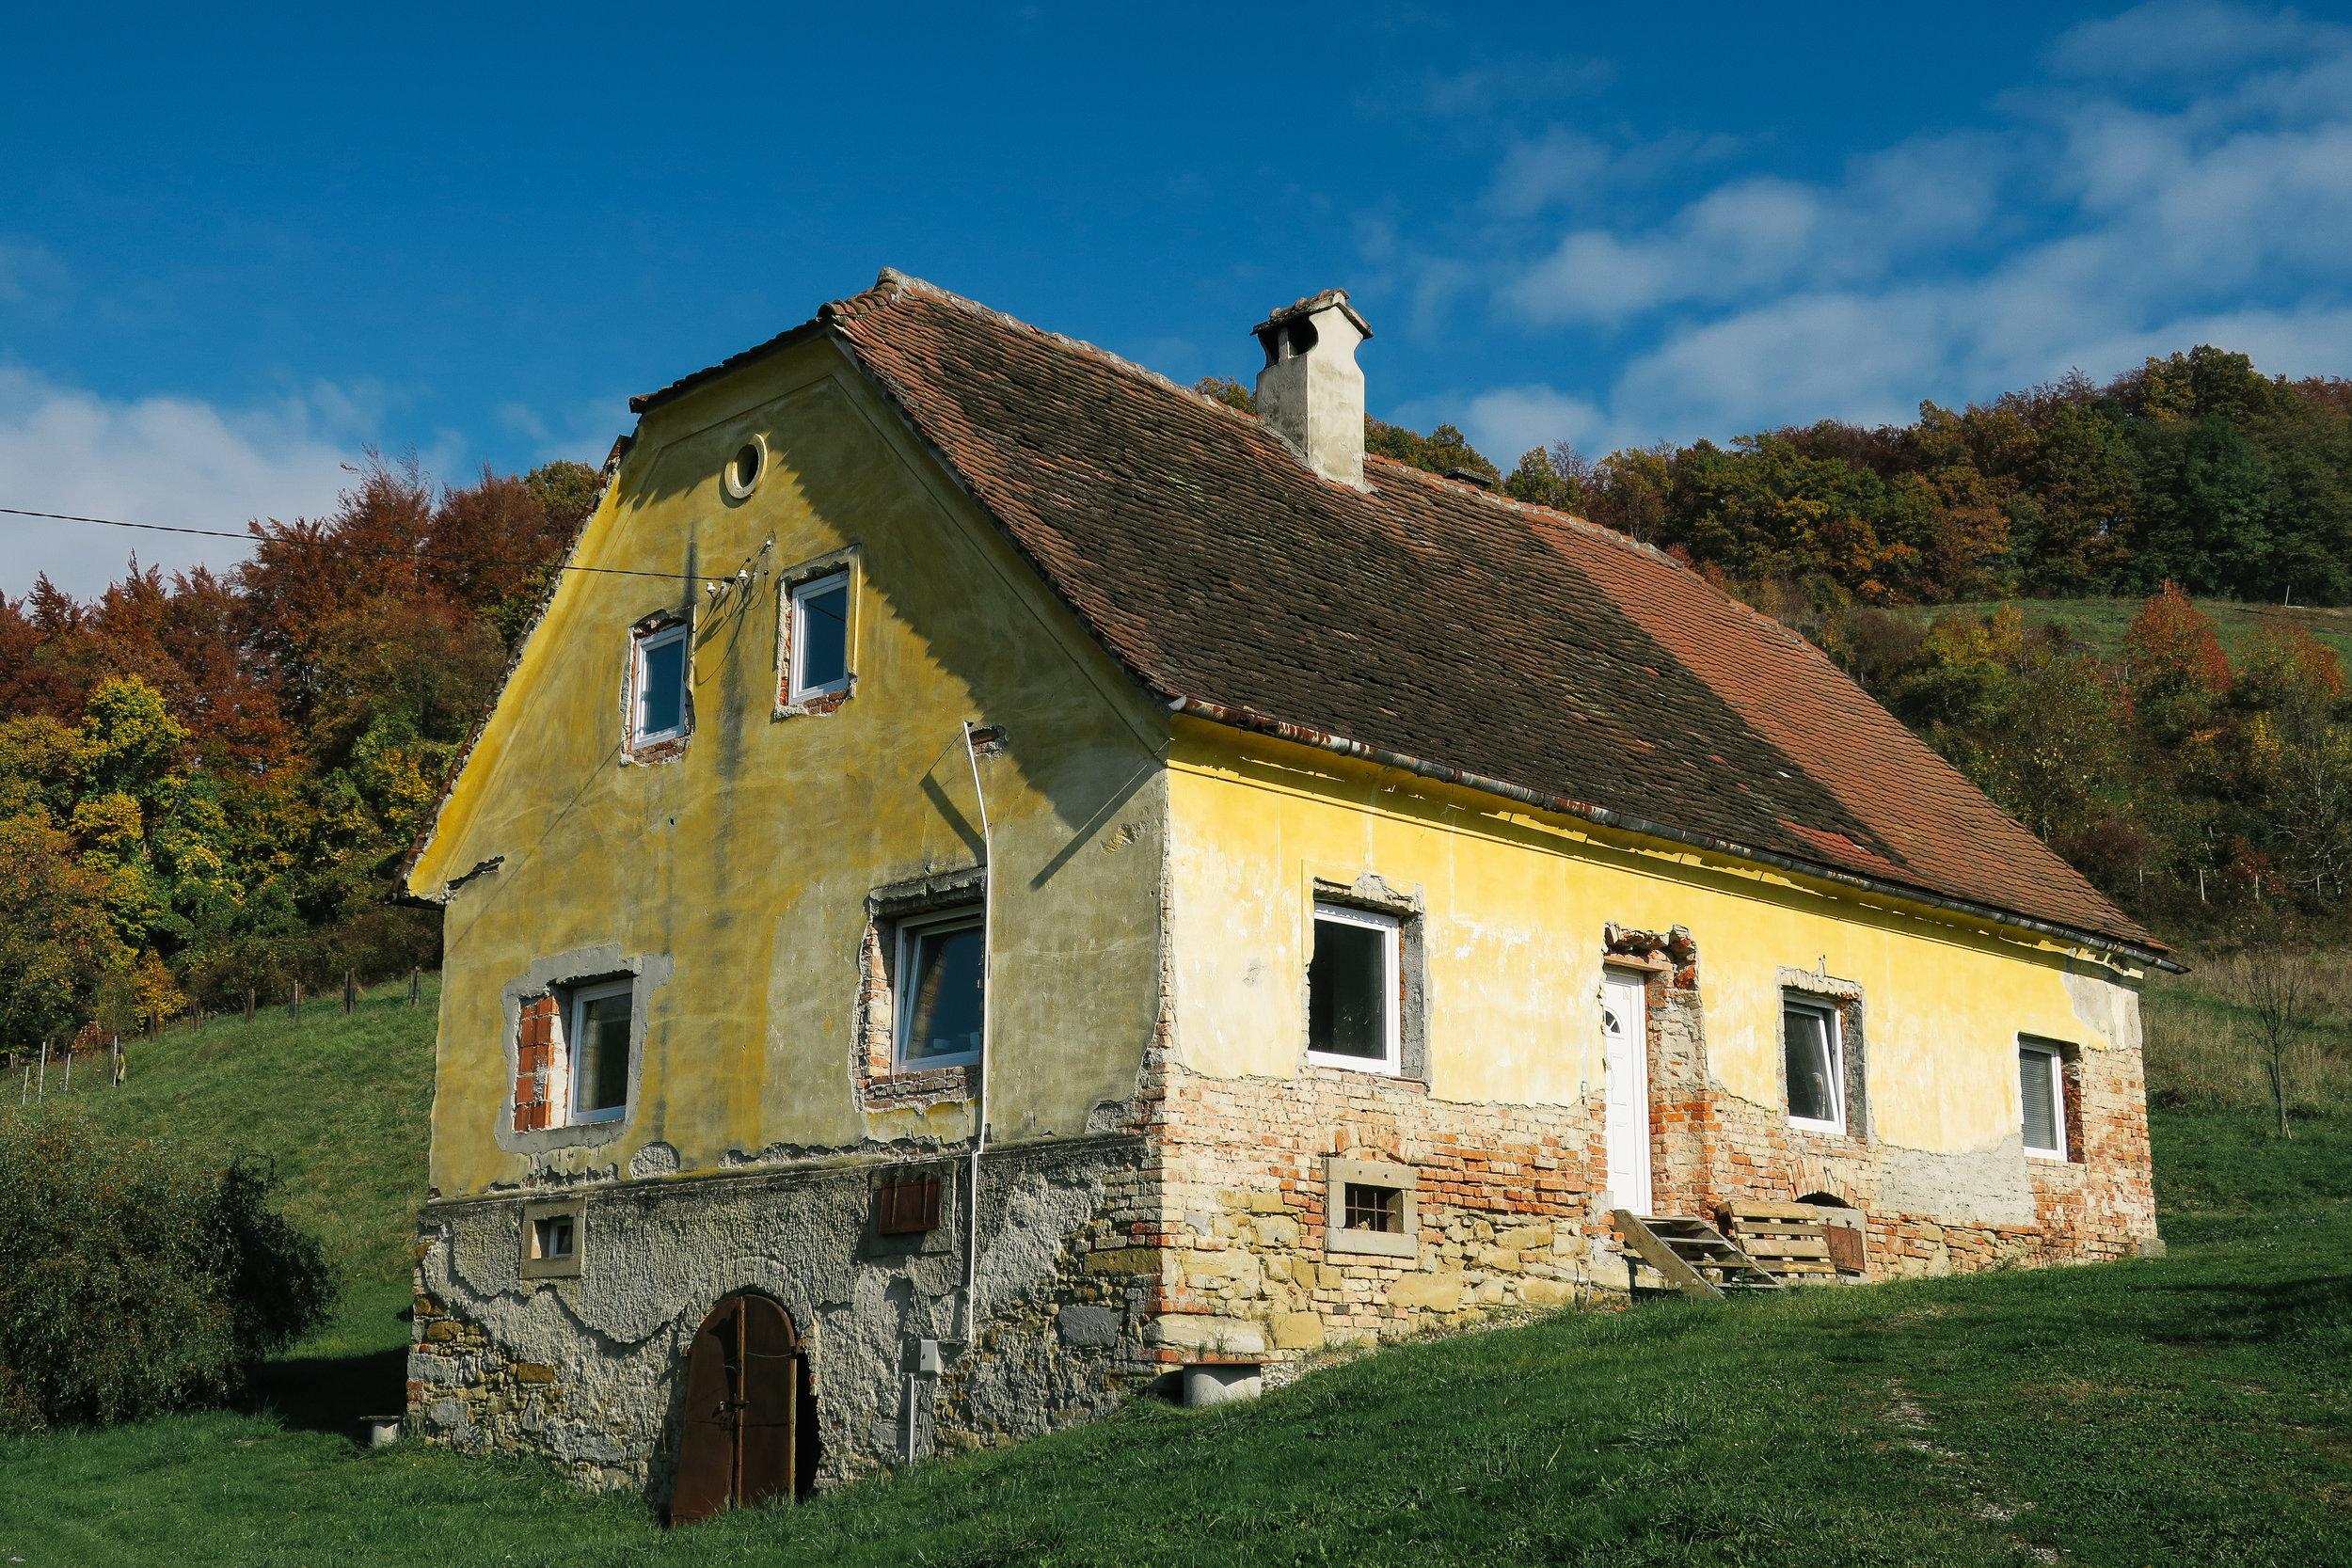 slovenia-travel-glamping-chateau-ramsak_IMG_4703.jpg